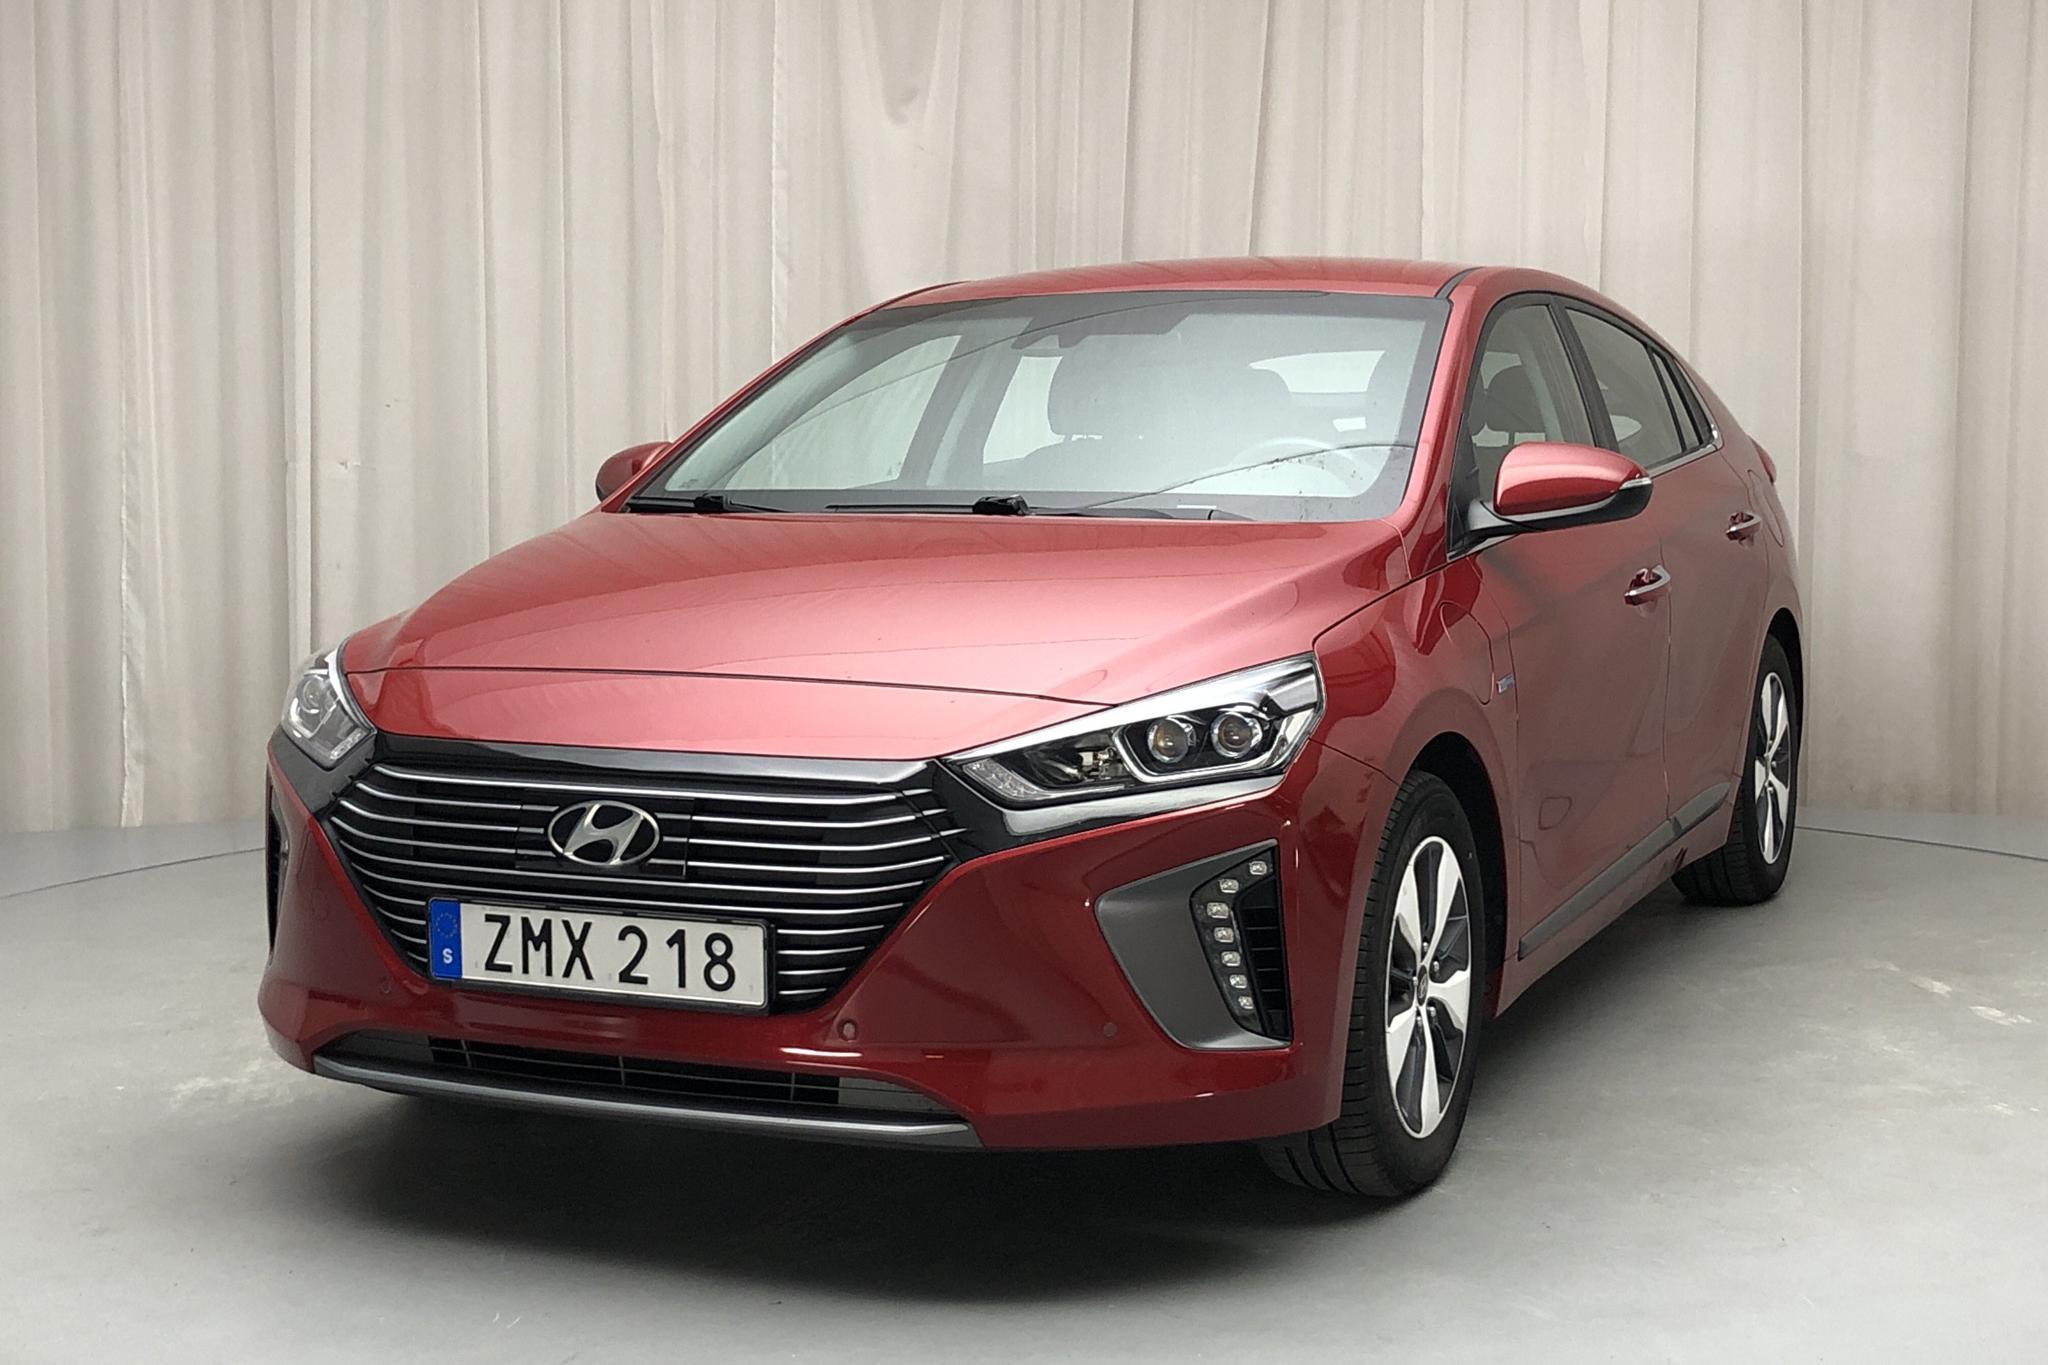 Hyundai IONIQ Plug-in (141hk) - 29 010 km - Automatic - red - 2019